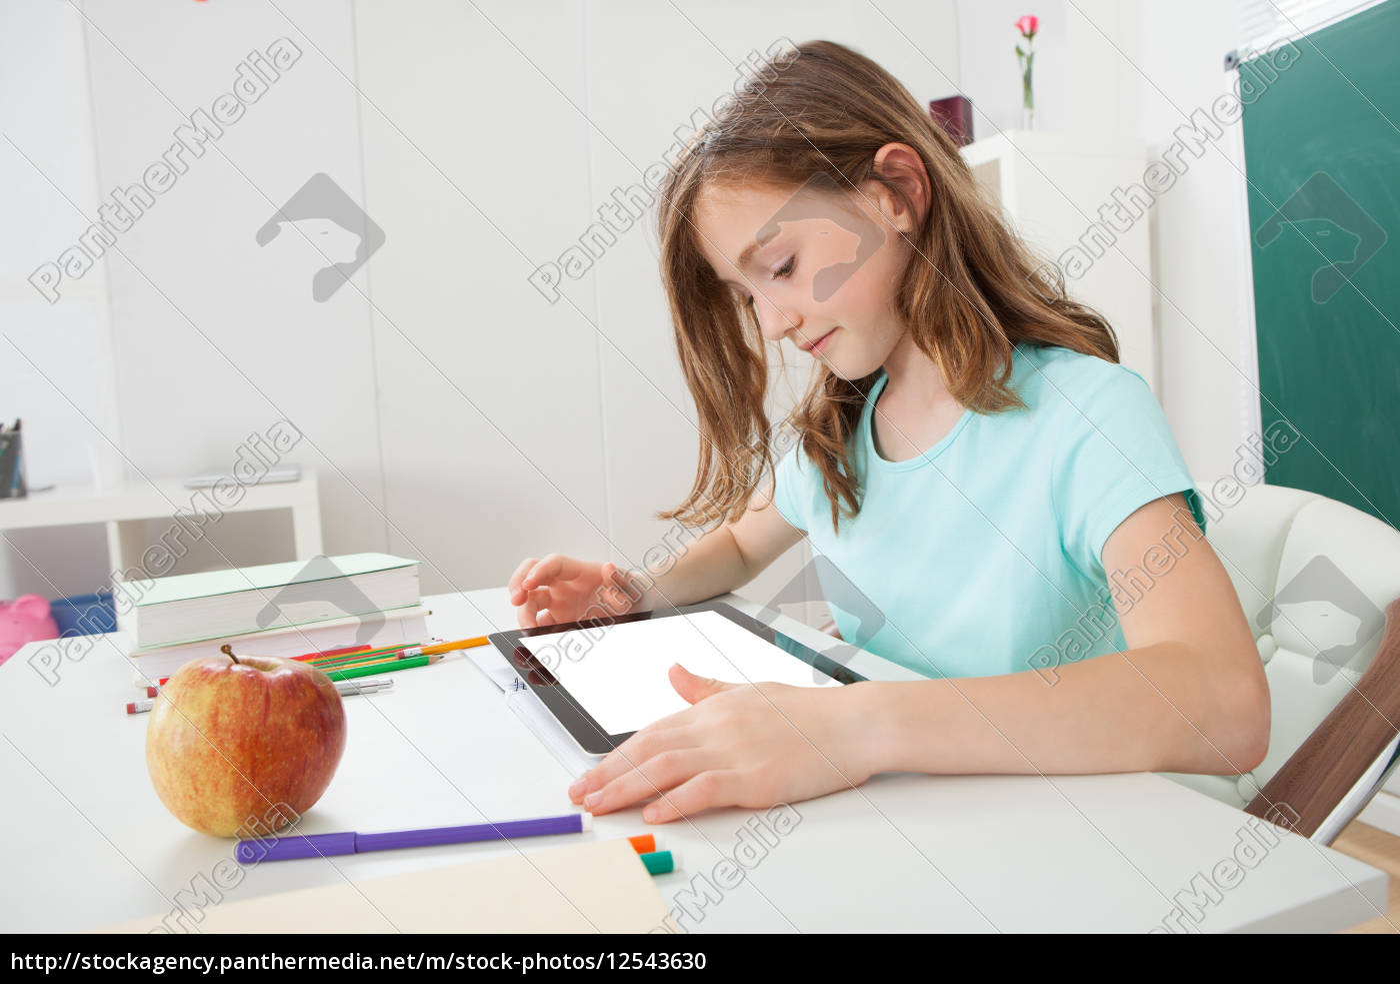 girl, using, digital, tablet, in, study - 12543630